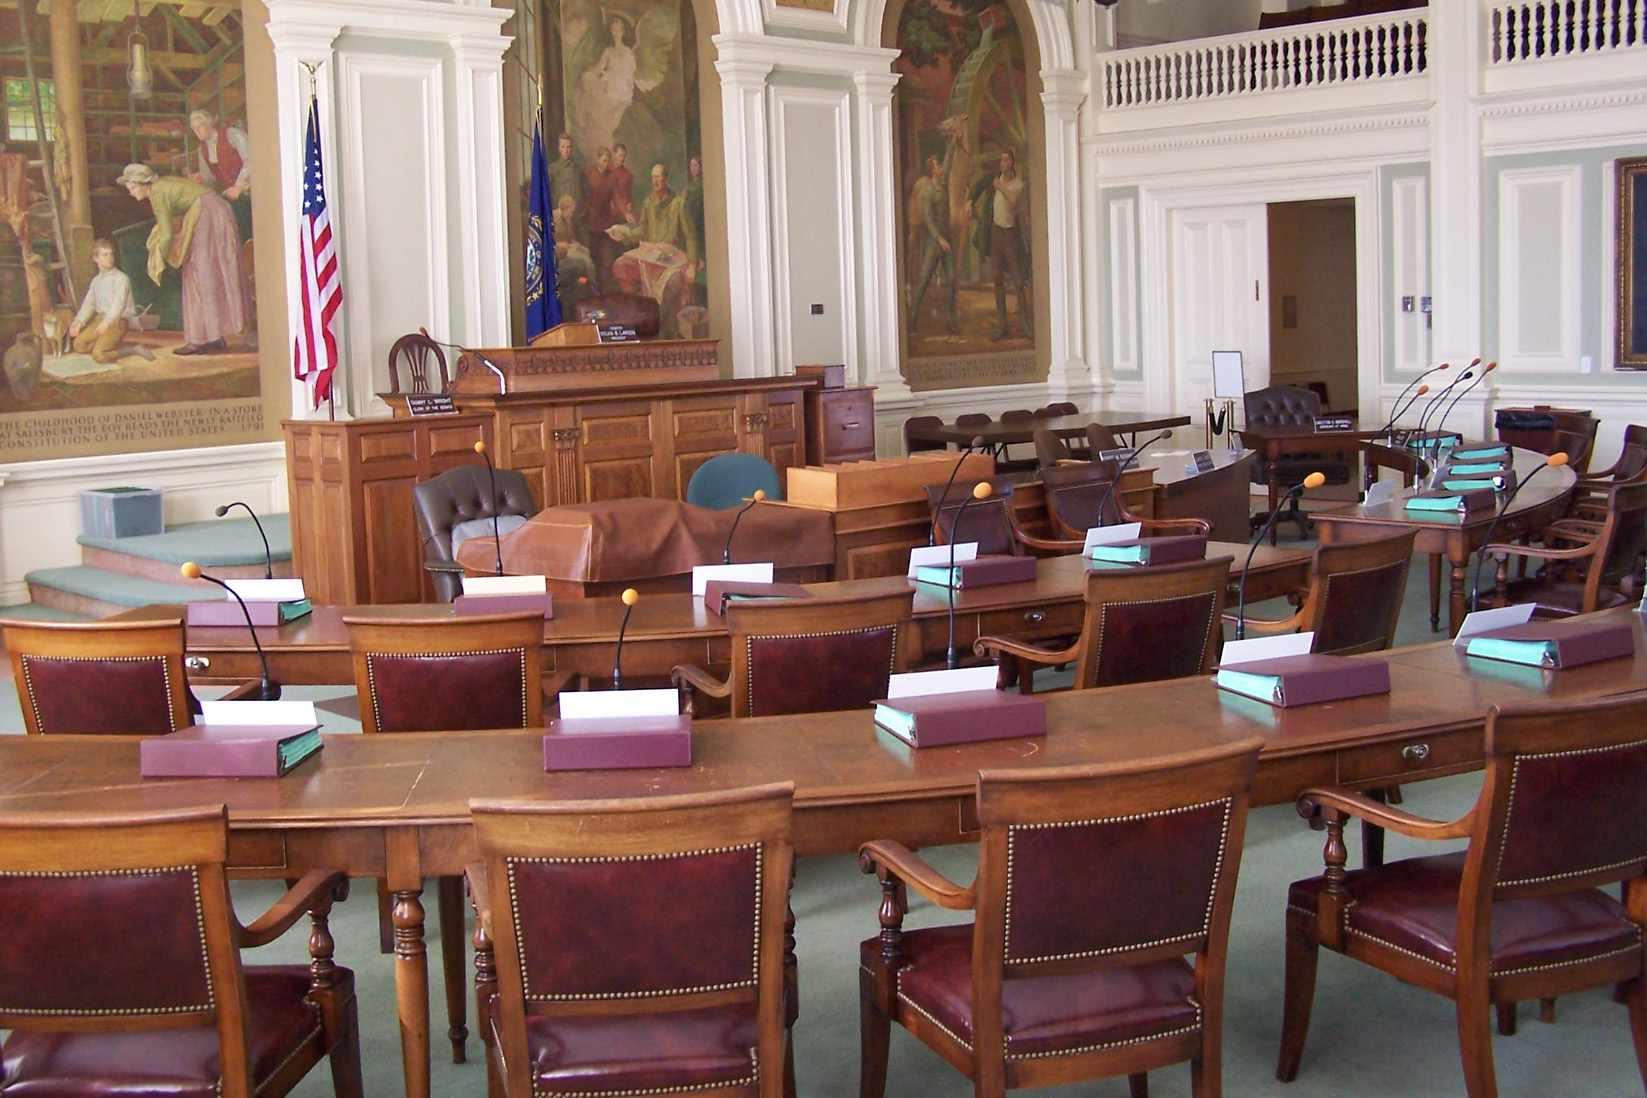 New Hampshire State Senate Chambers